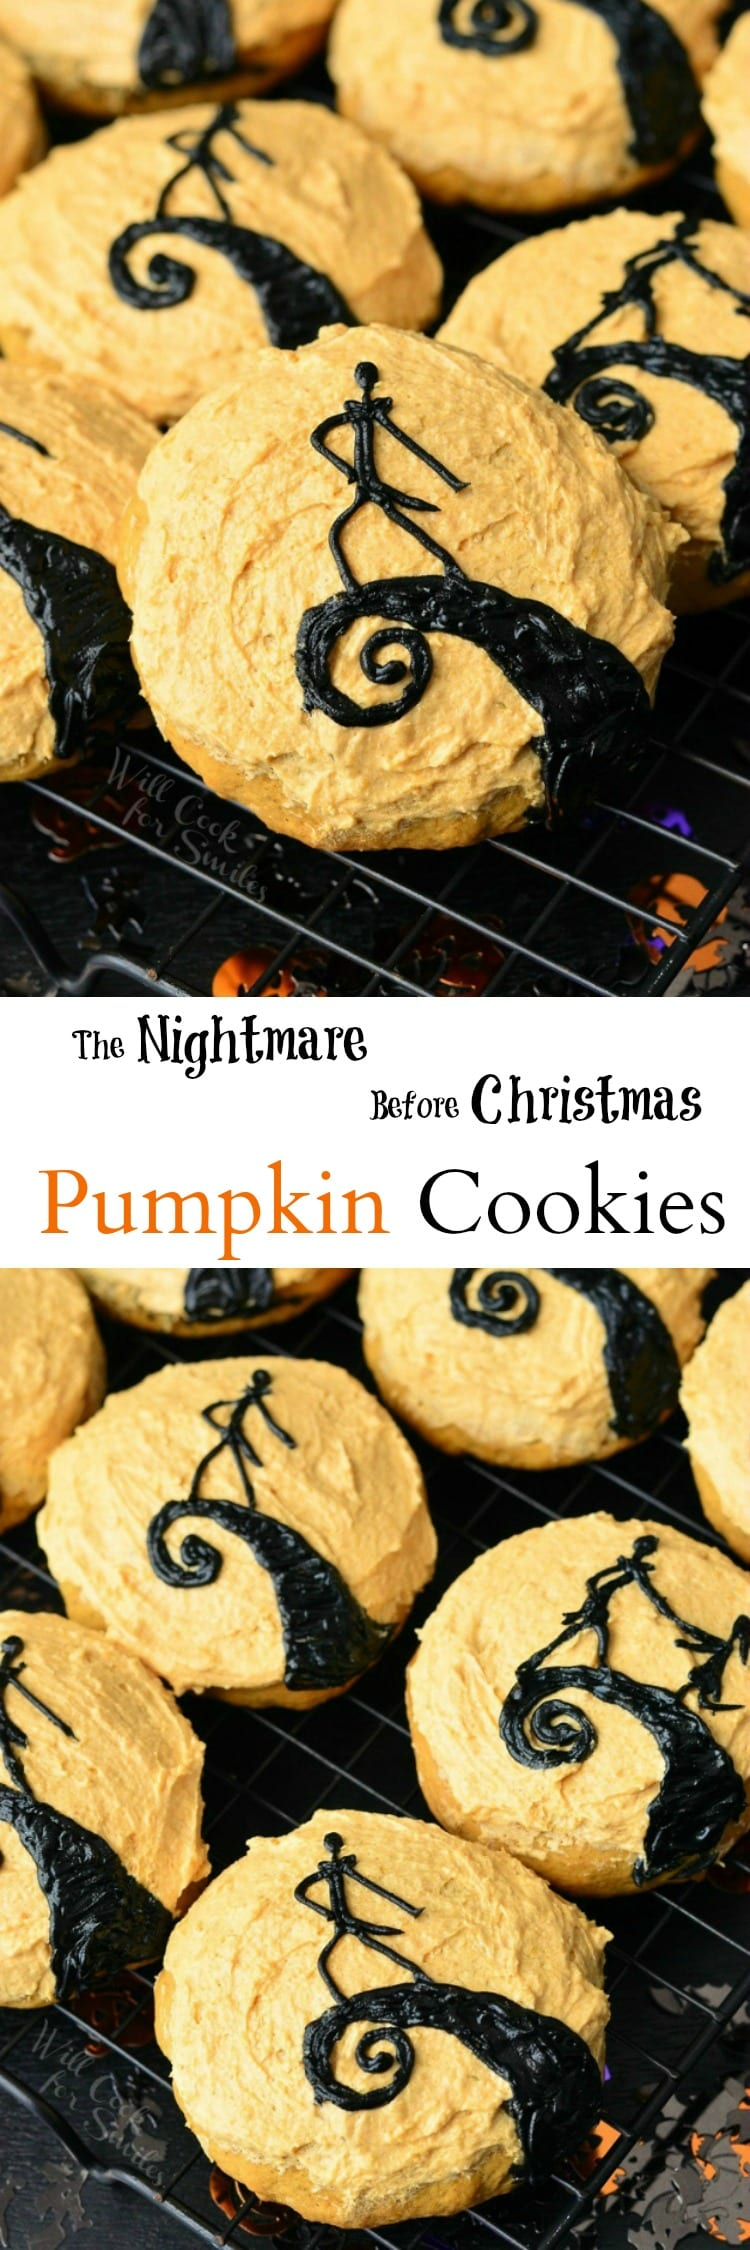 The Nightmare Before Christmas Pumpkin Cookies. FUN cookies to serve for Halloween parties to all that LOVE The Nightmare Before Christmas.